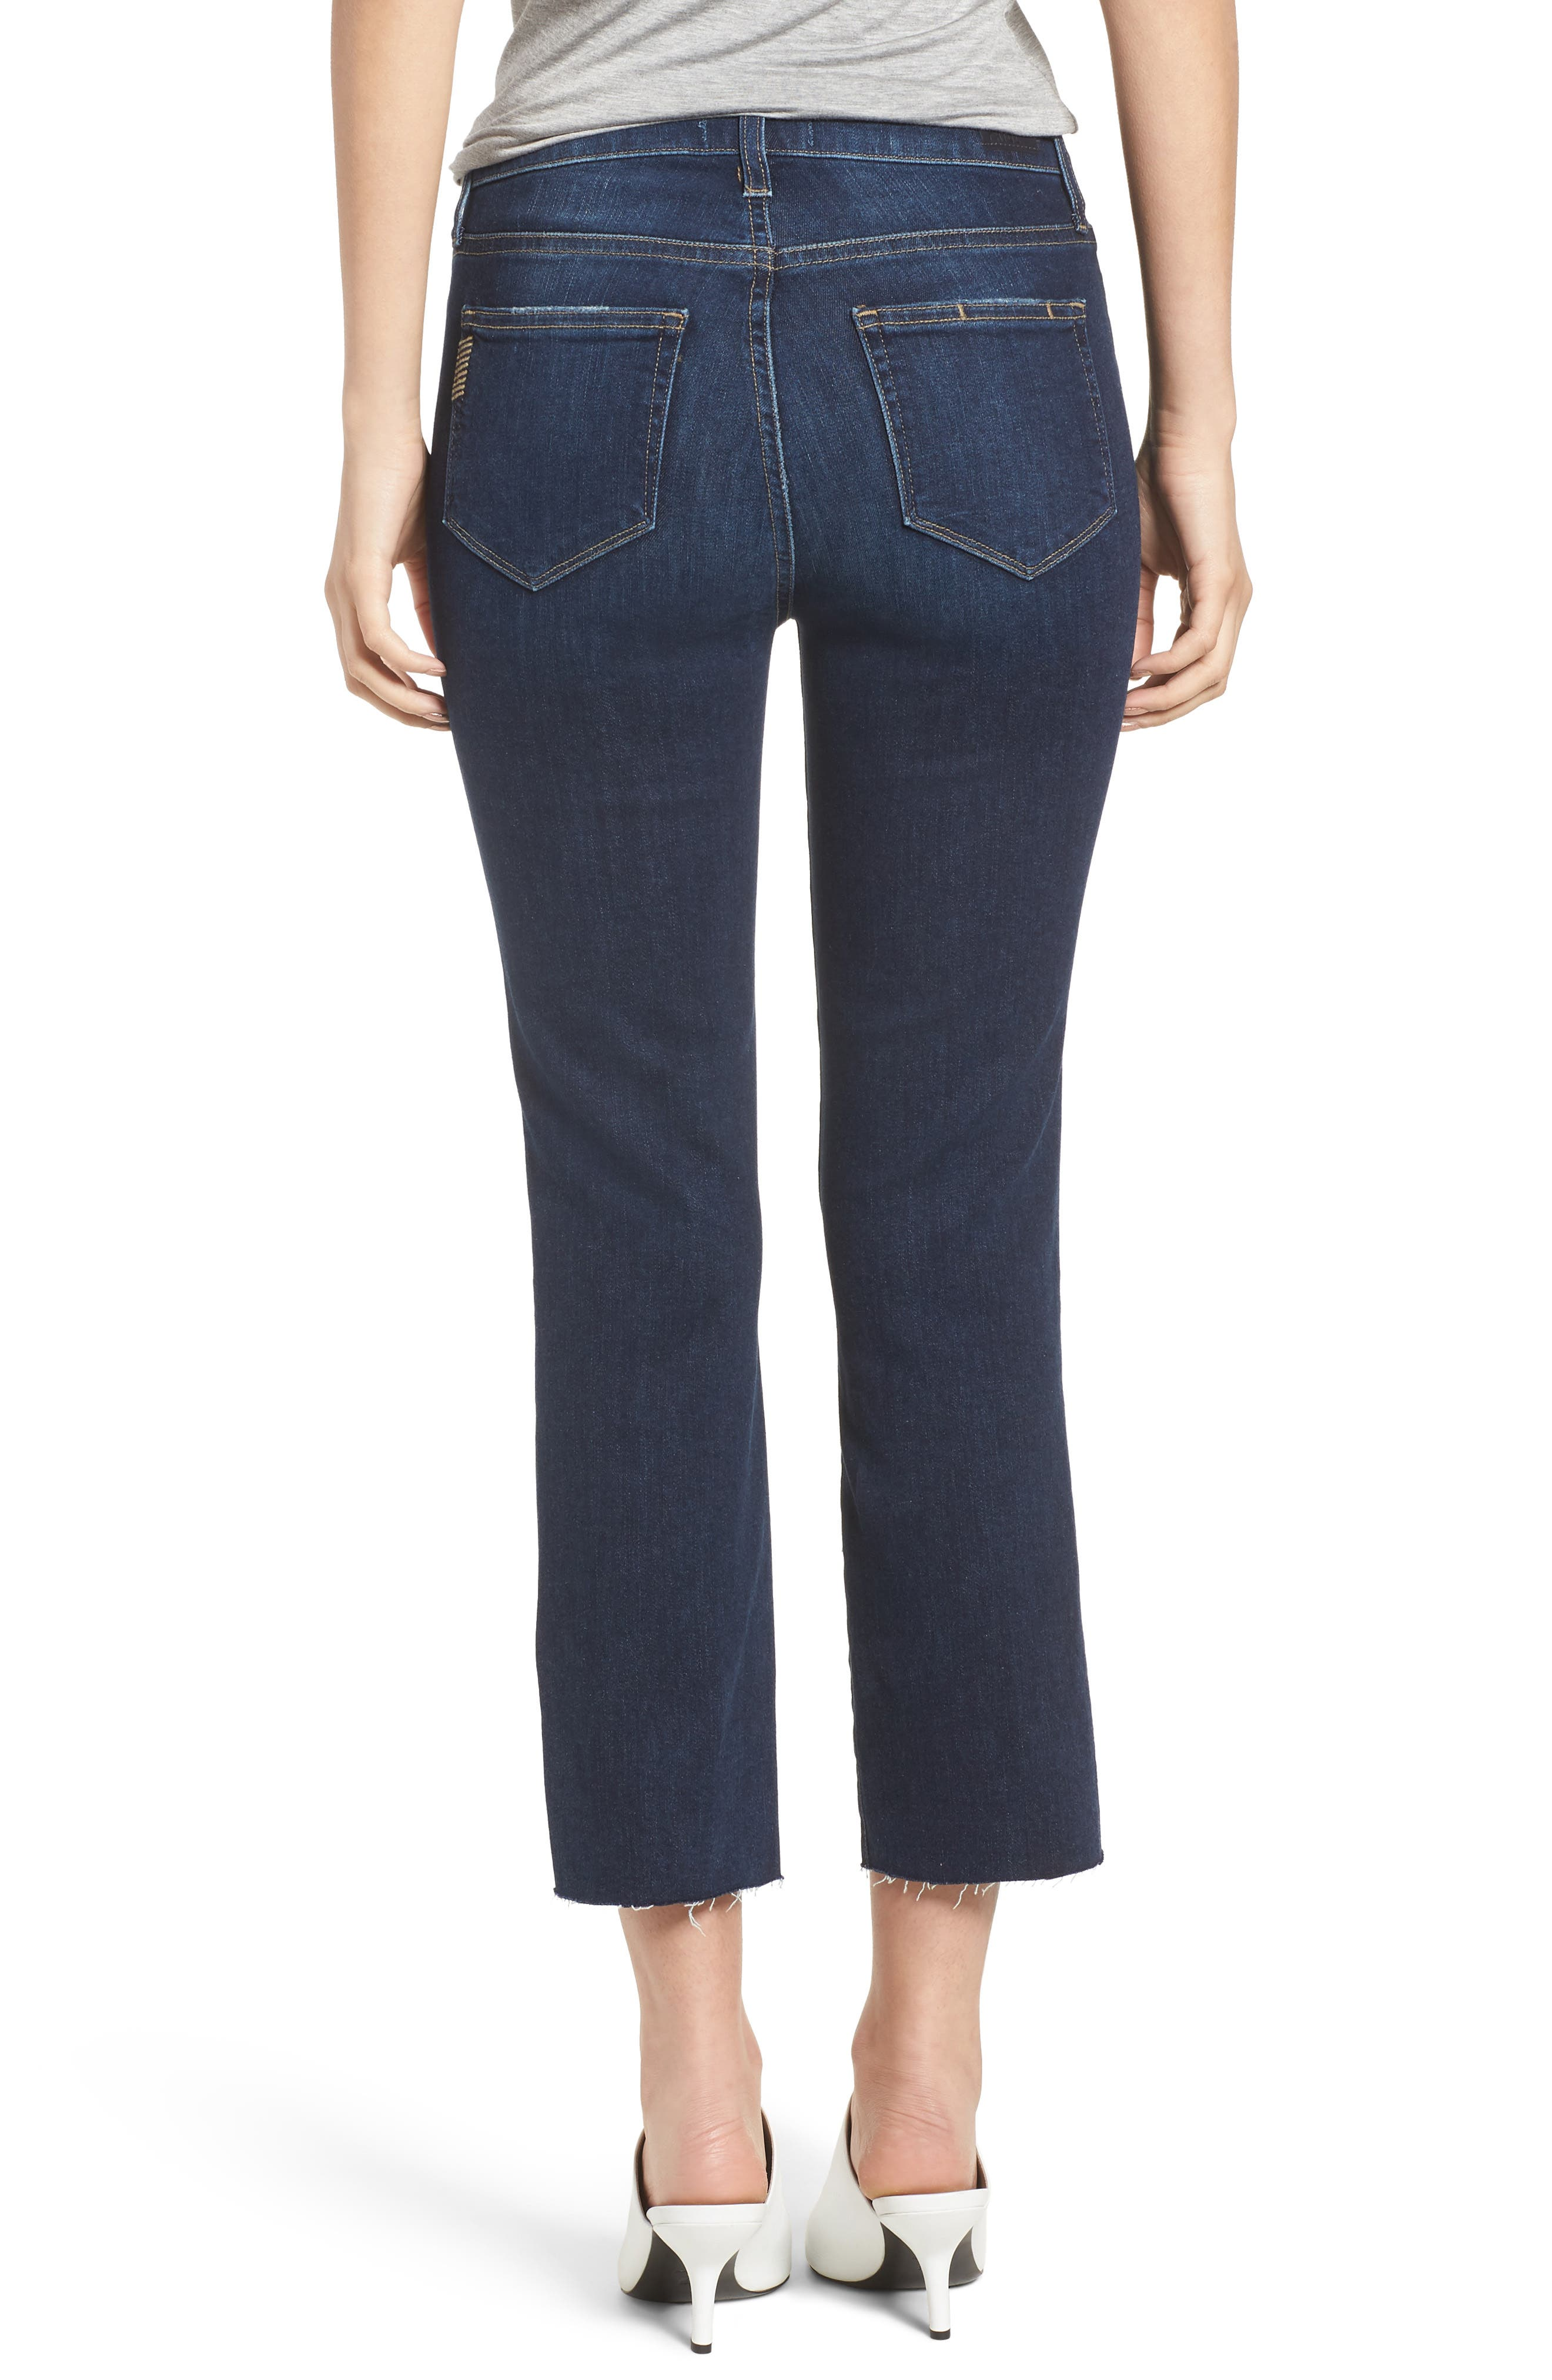 Hoxton High Waist Crop Straight Leg Jeans,                             Alternate thumbnail 2, color,                             Mazzetti